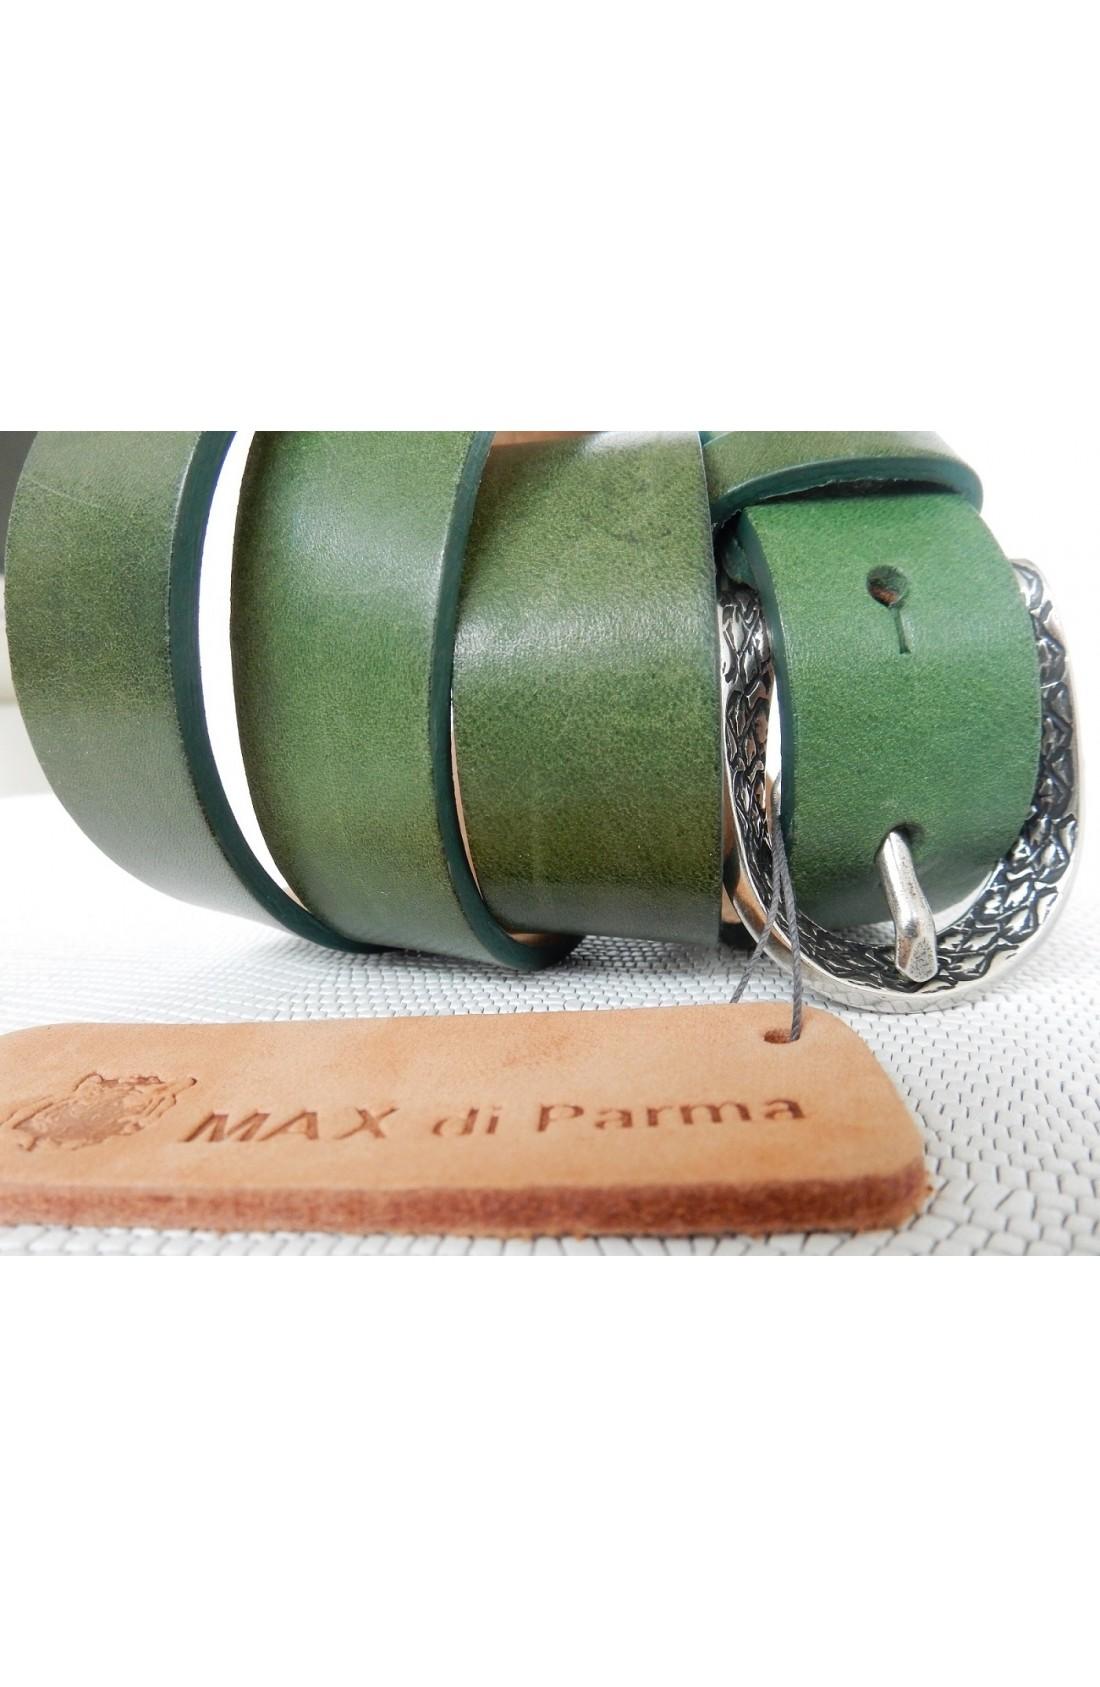 CINTURA DONNA art.493 KANSAS su spalle toro mm.25 var.62 verde avocado fibbia F 31 mm.25 argento vecchio (1)